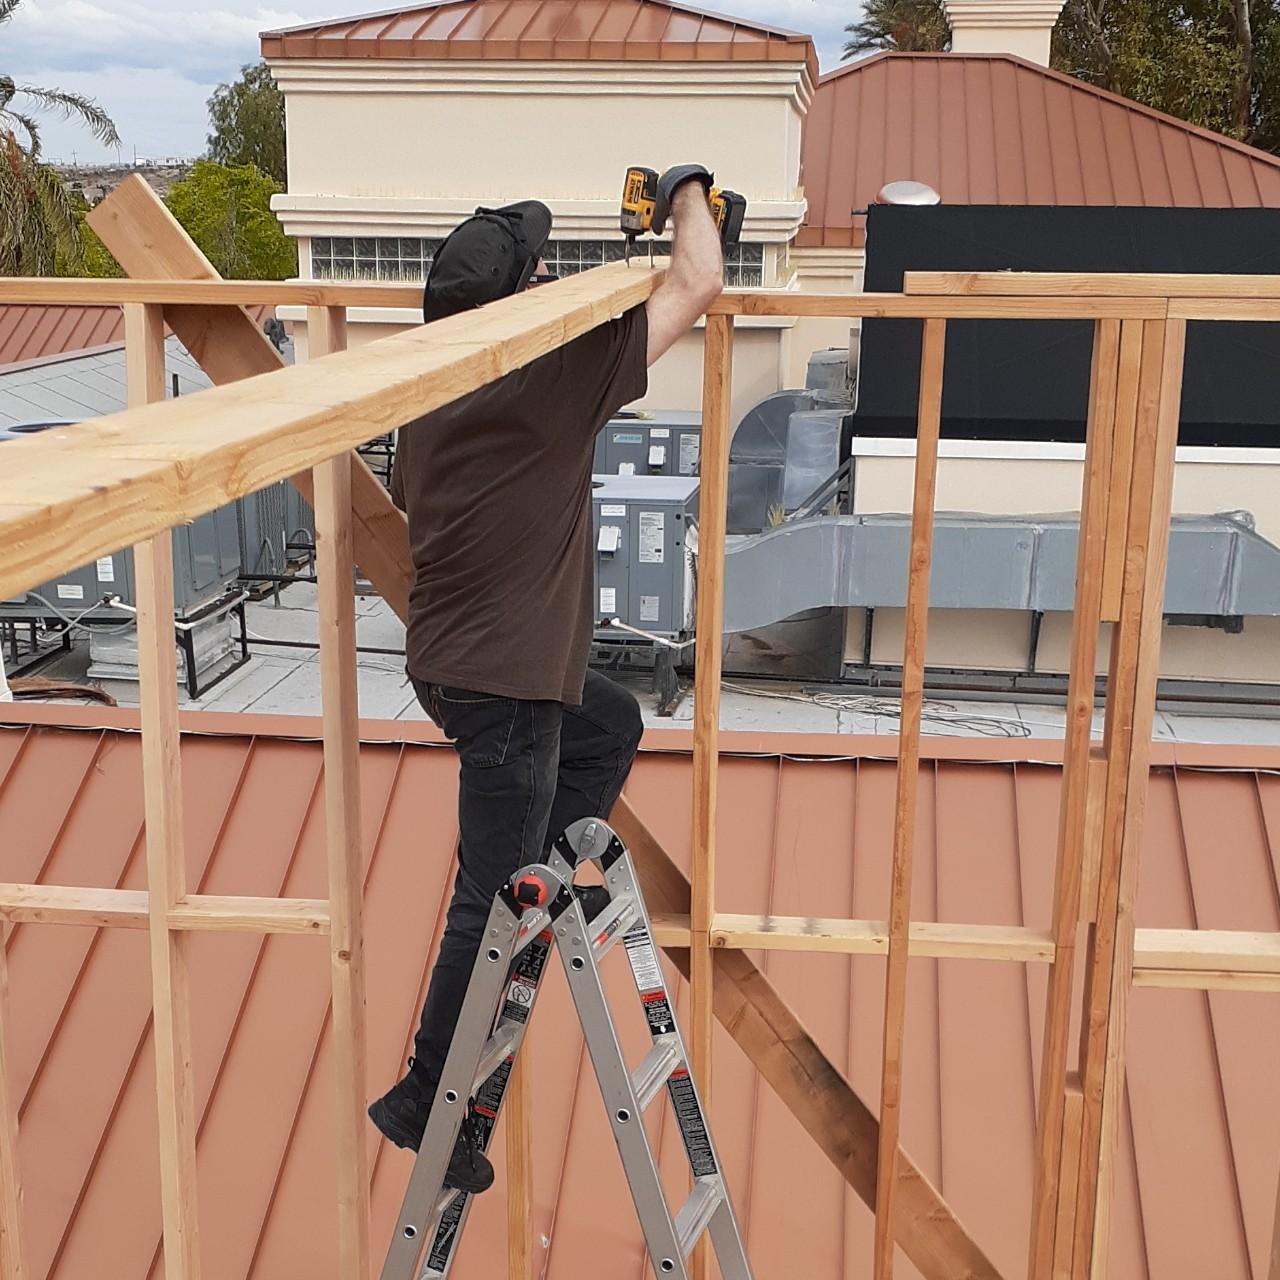 carpentry-wood-framing-second-floor-home-addition--framing-97